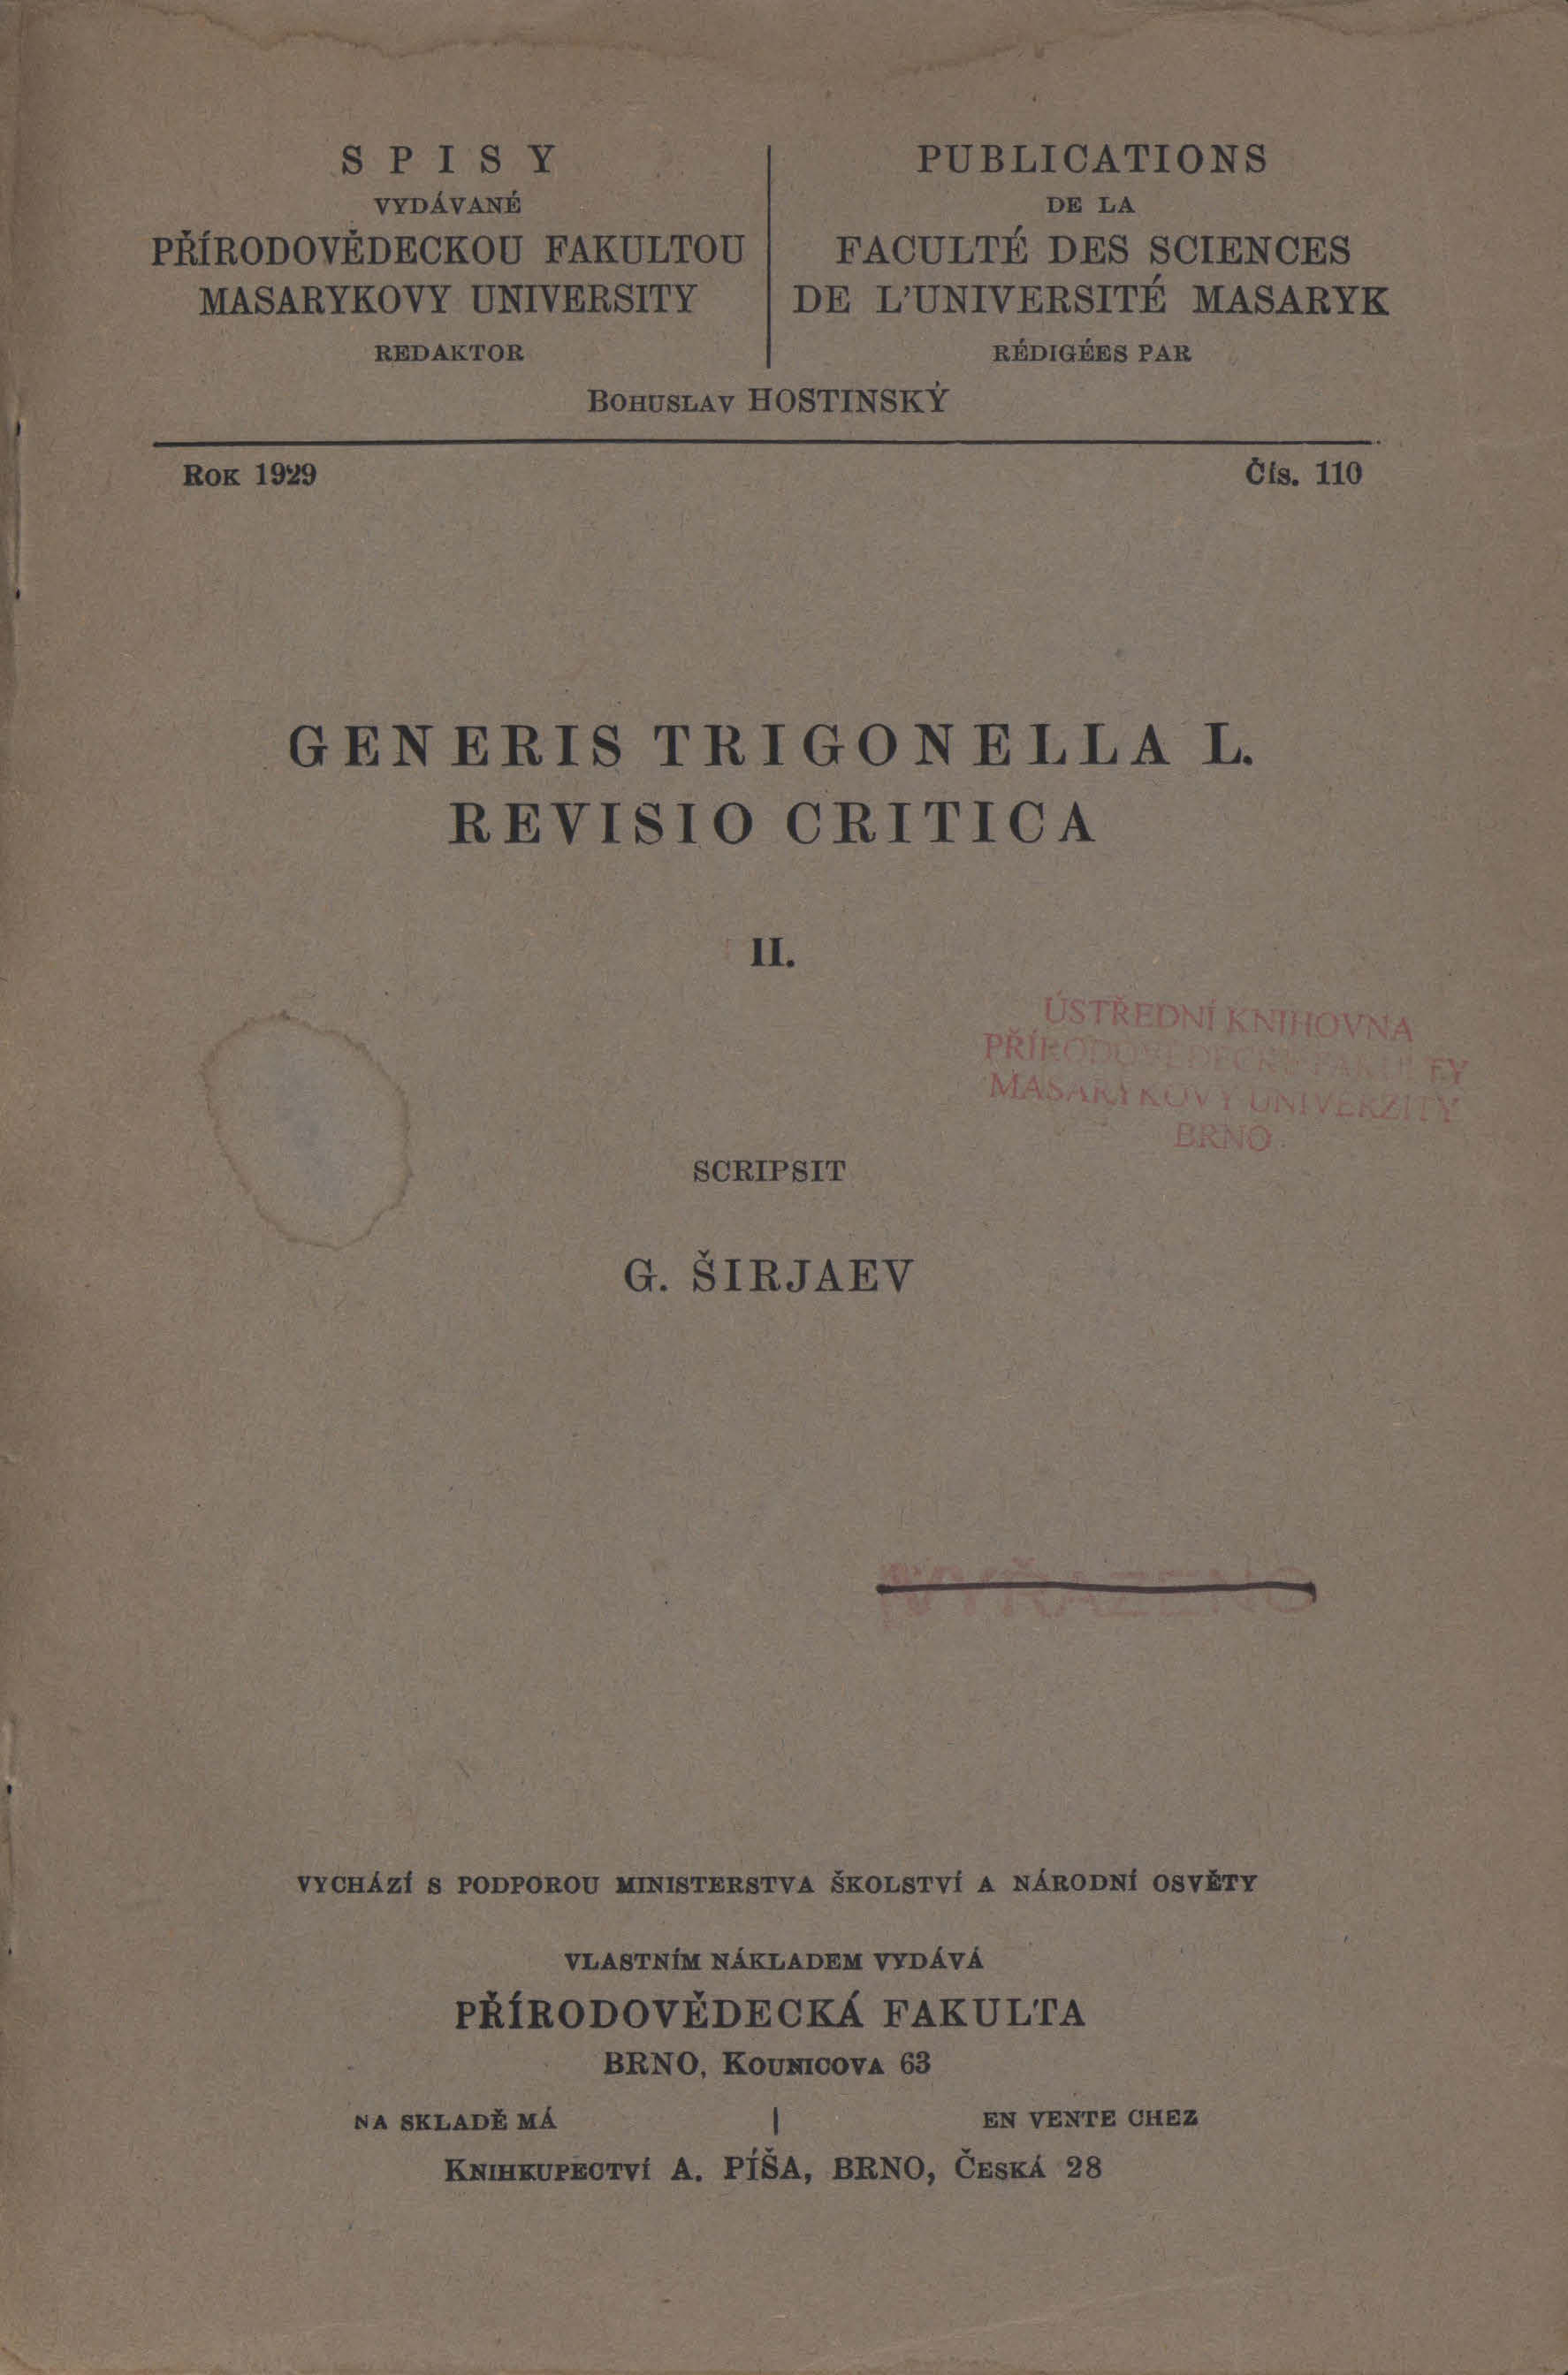 Obálka pro Generis Trigonella L. revisio critica II